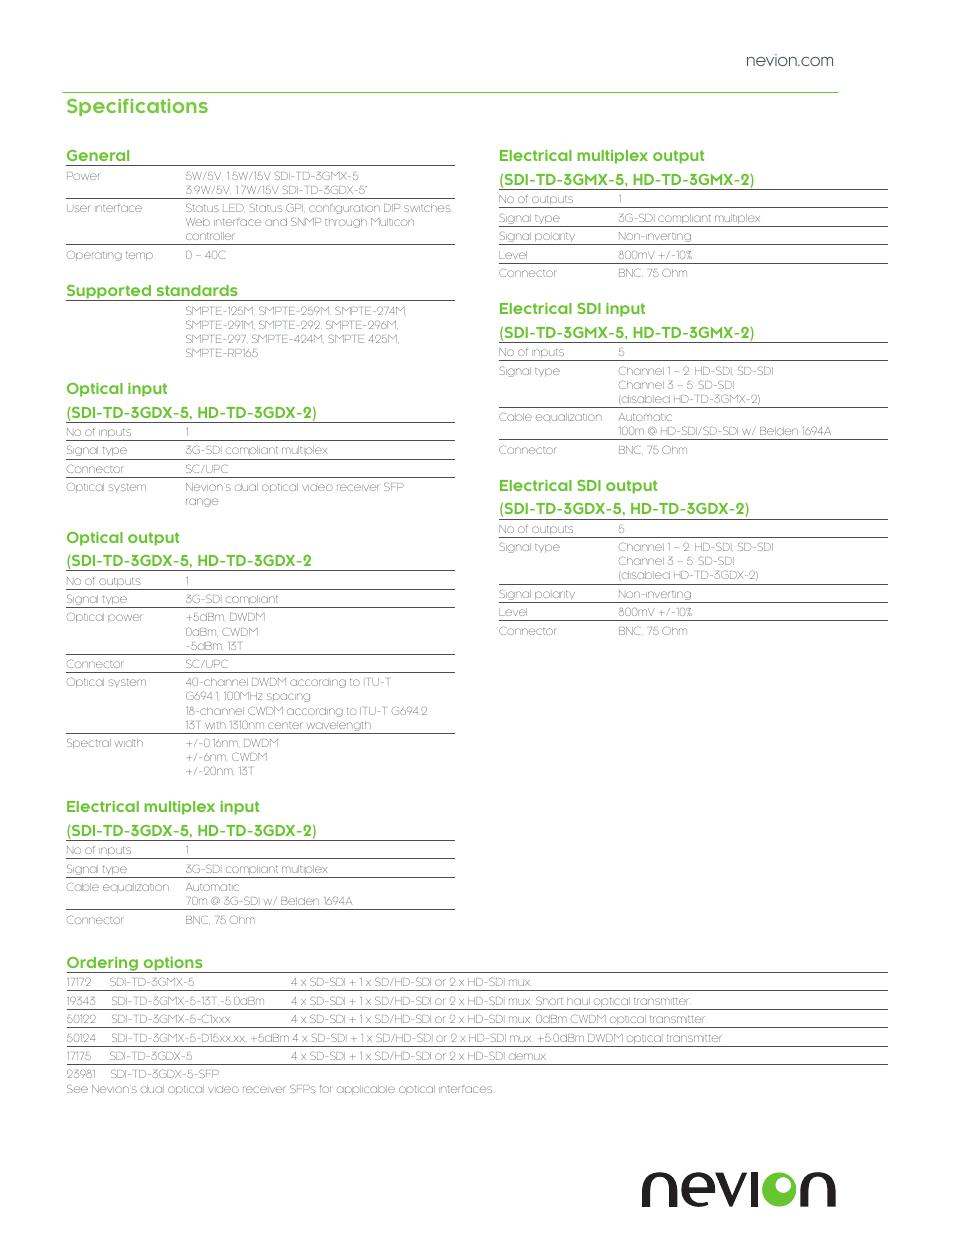 Specifications | Nevion SDI-TD-3GMX-5 User Manual | Page 3 / 4